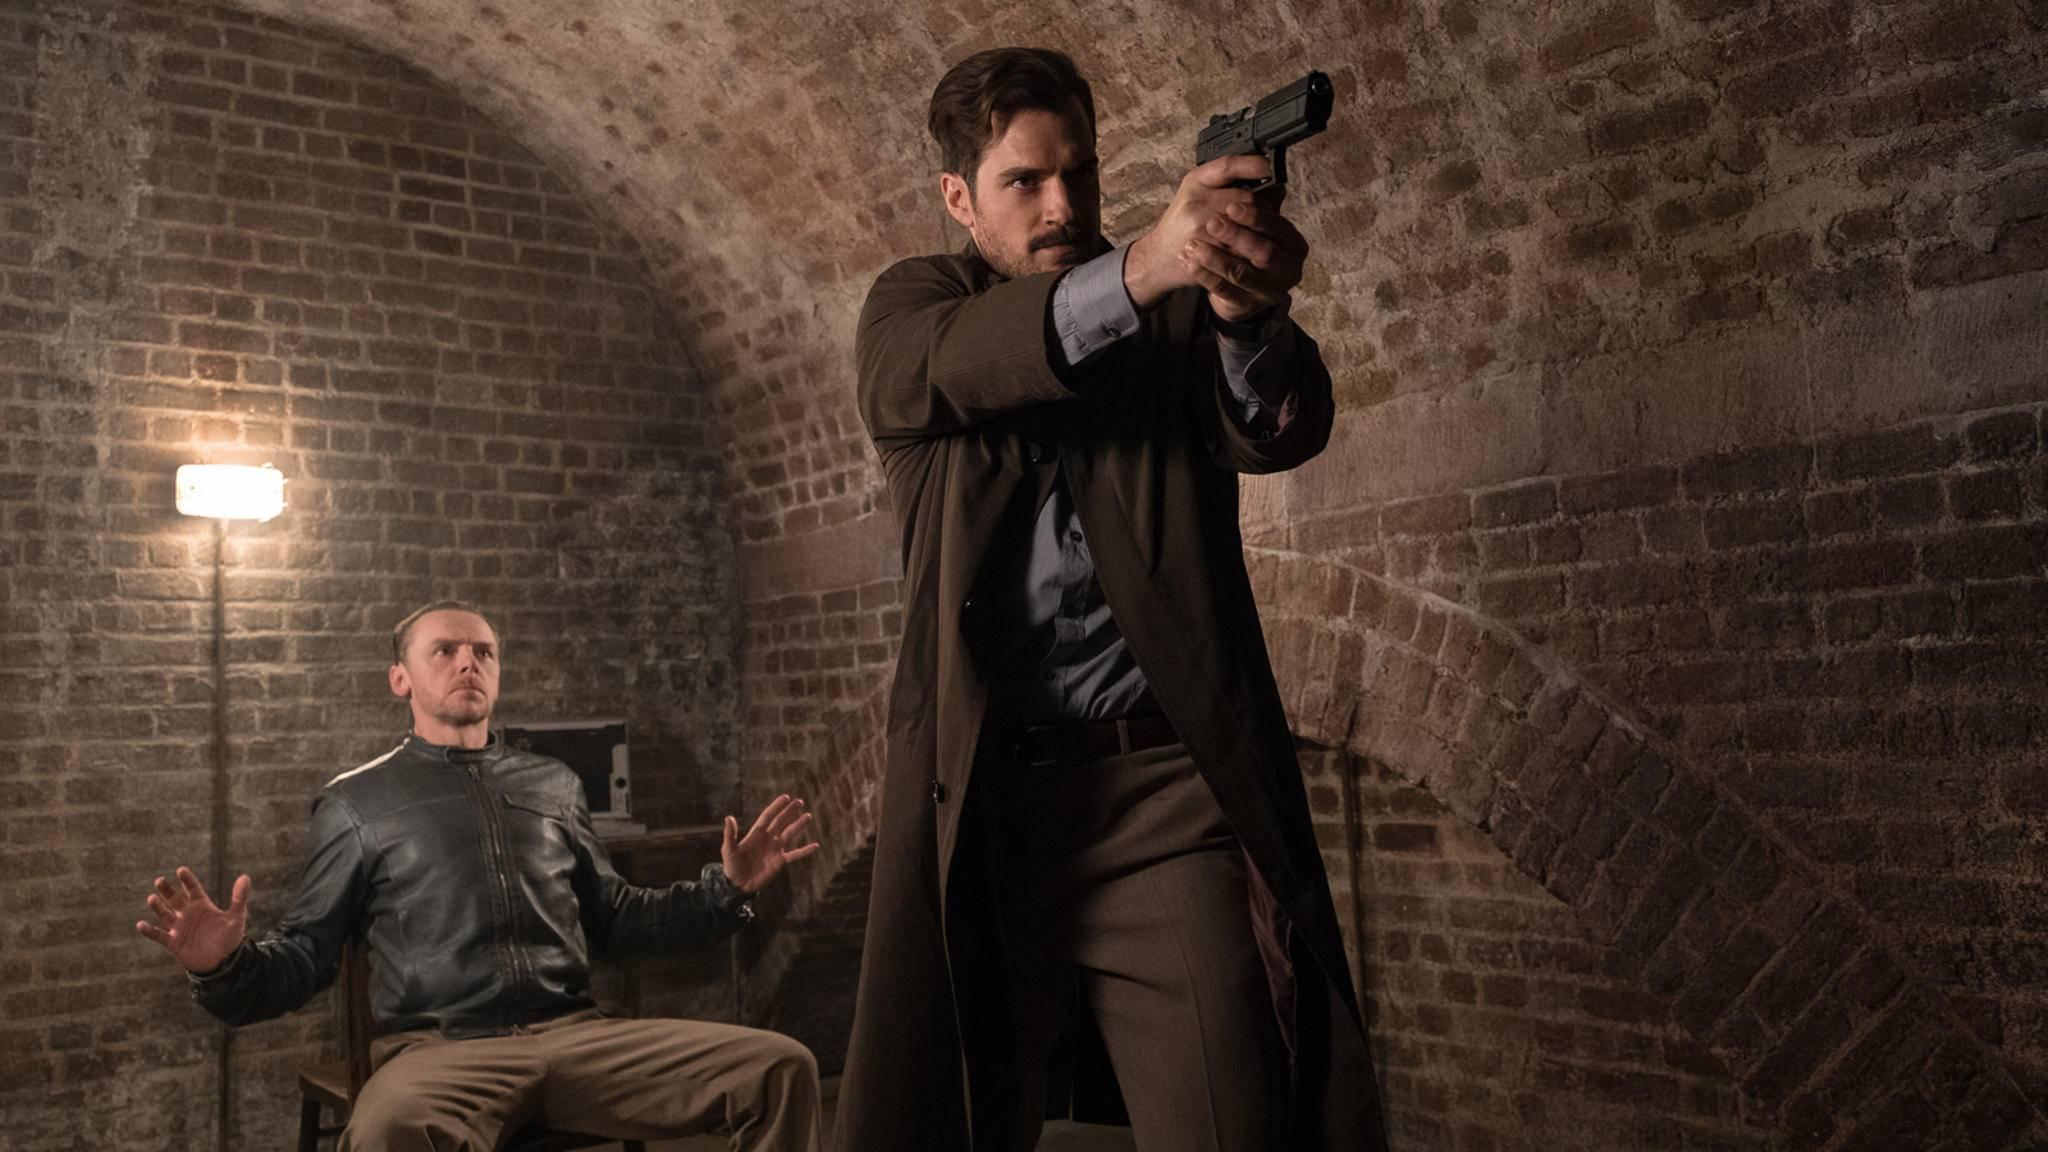 Ob wir Henry Cavill wohl als Nächstes als James Bond bewundern dürfen?